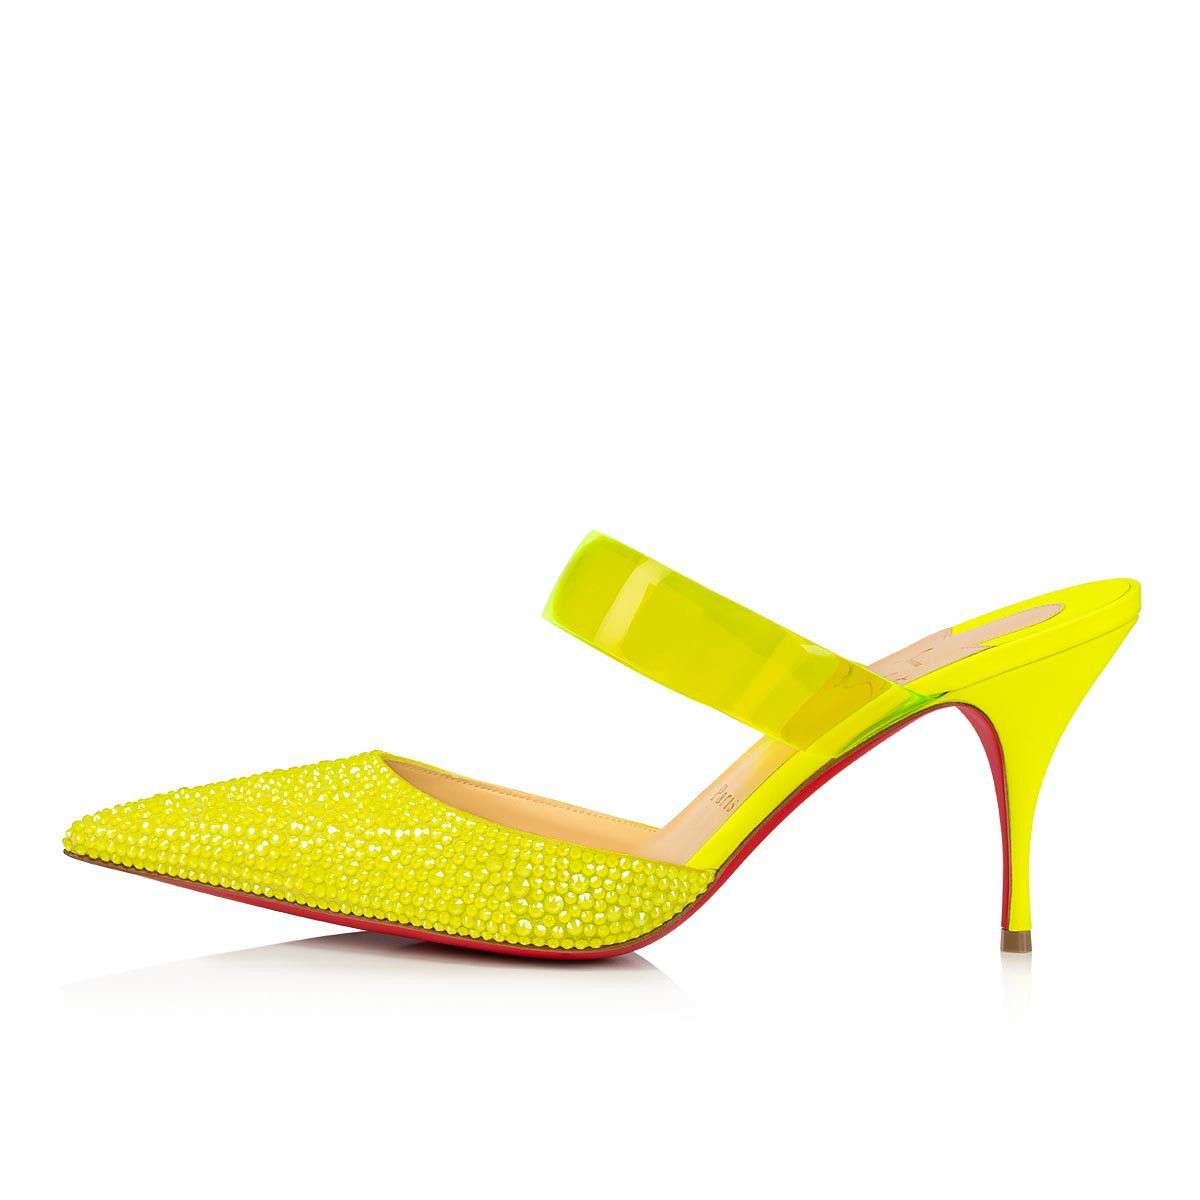 Shoes - Choc Pvc - Christian Louboutin